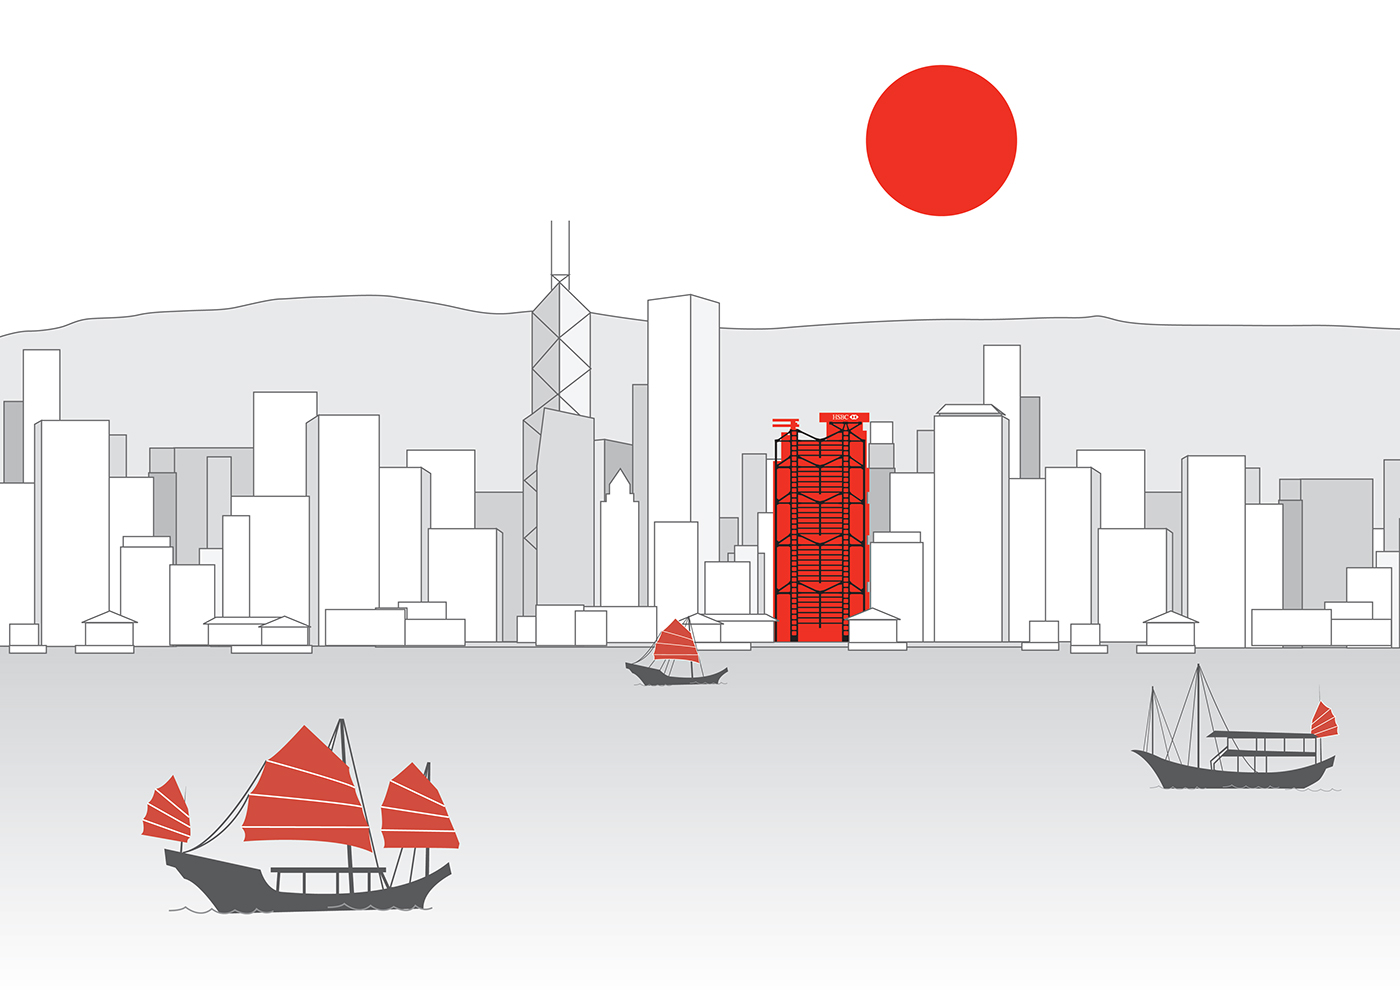 SIBOS HSBC Hong Kong